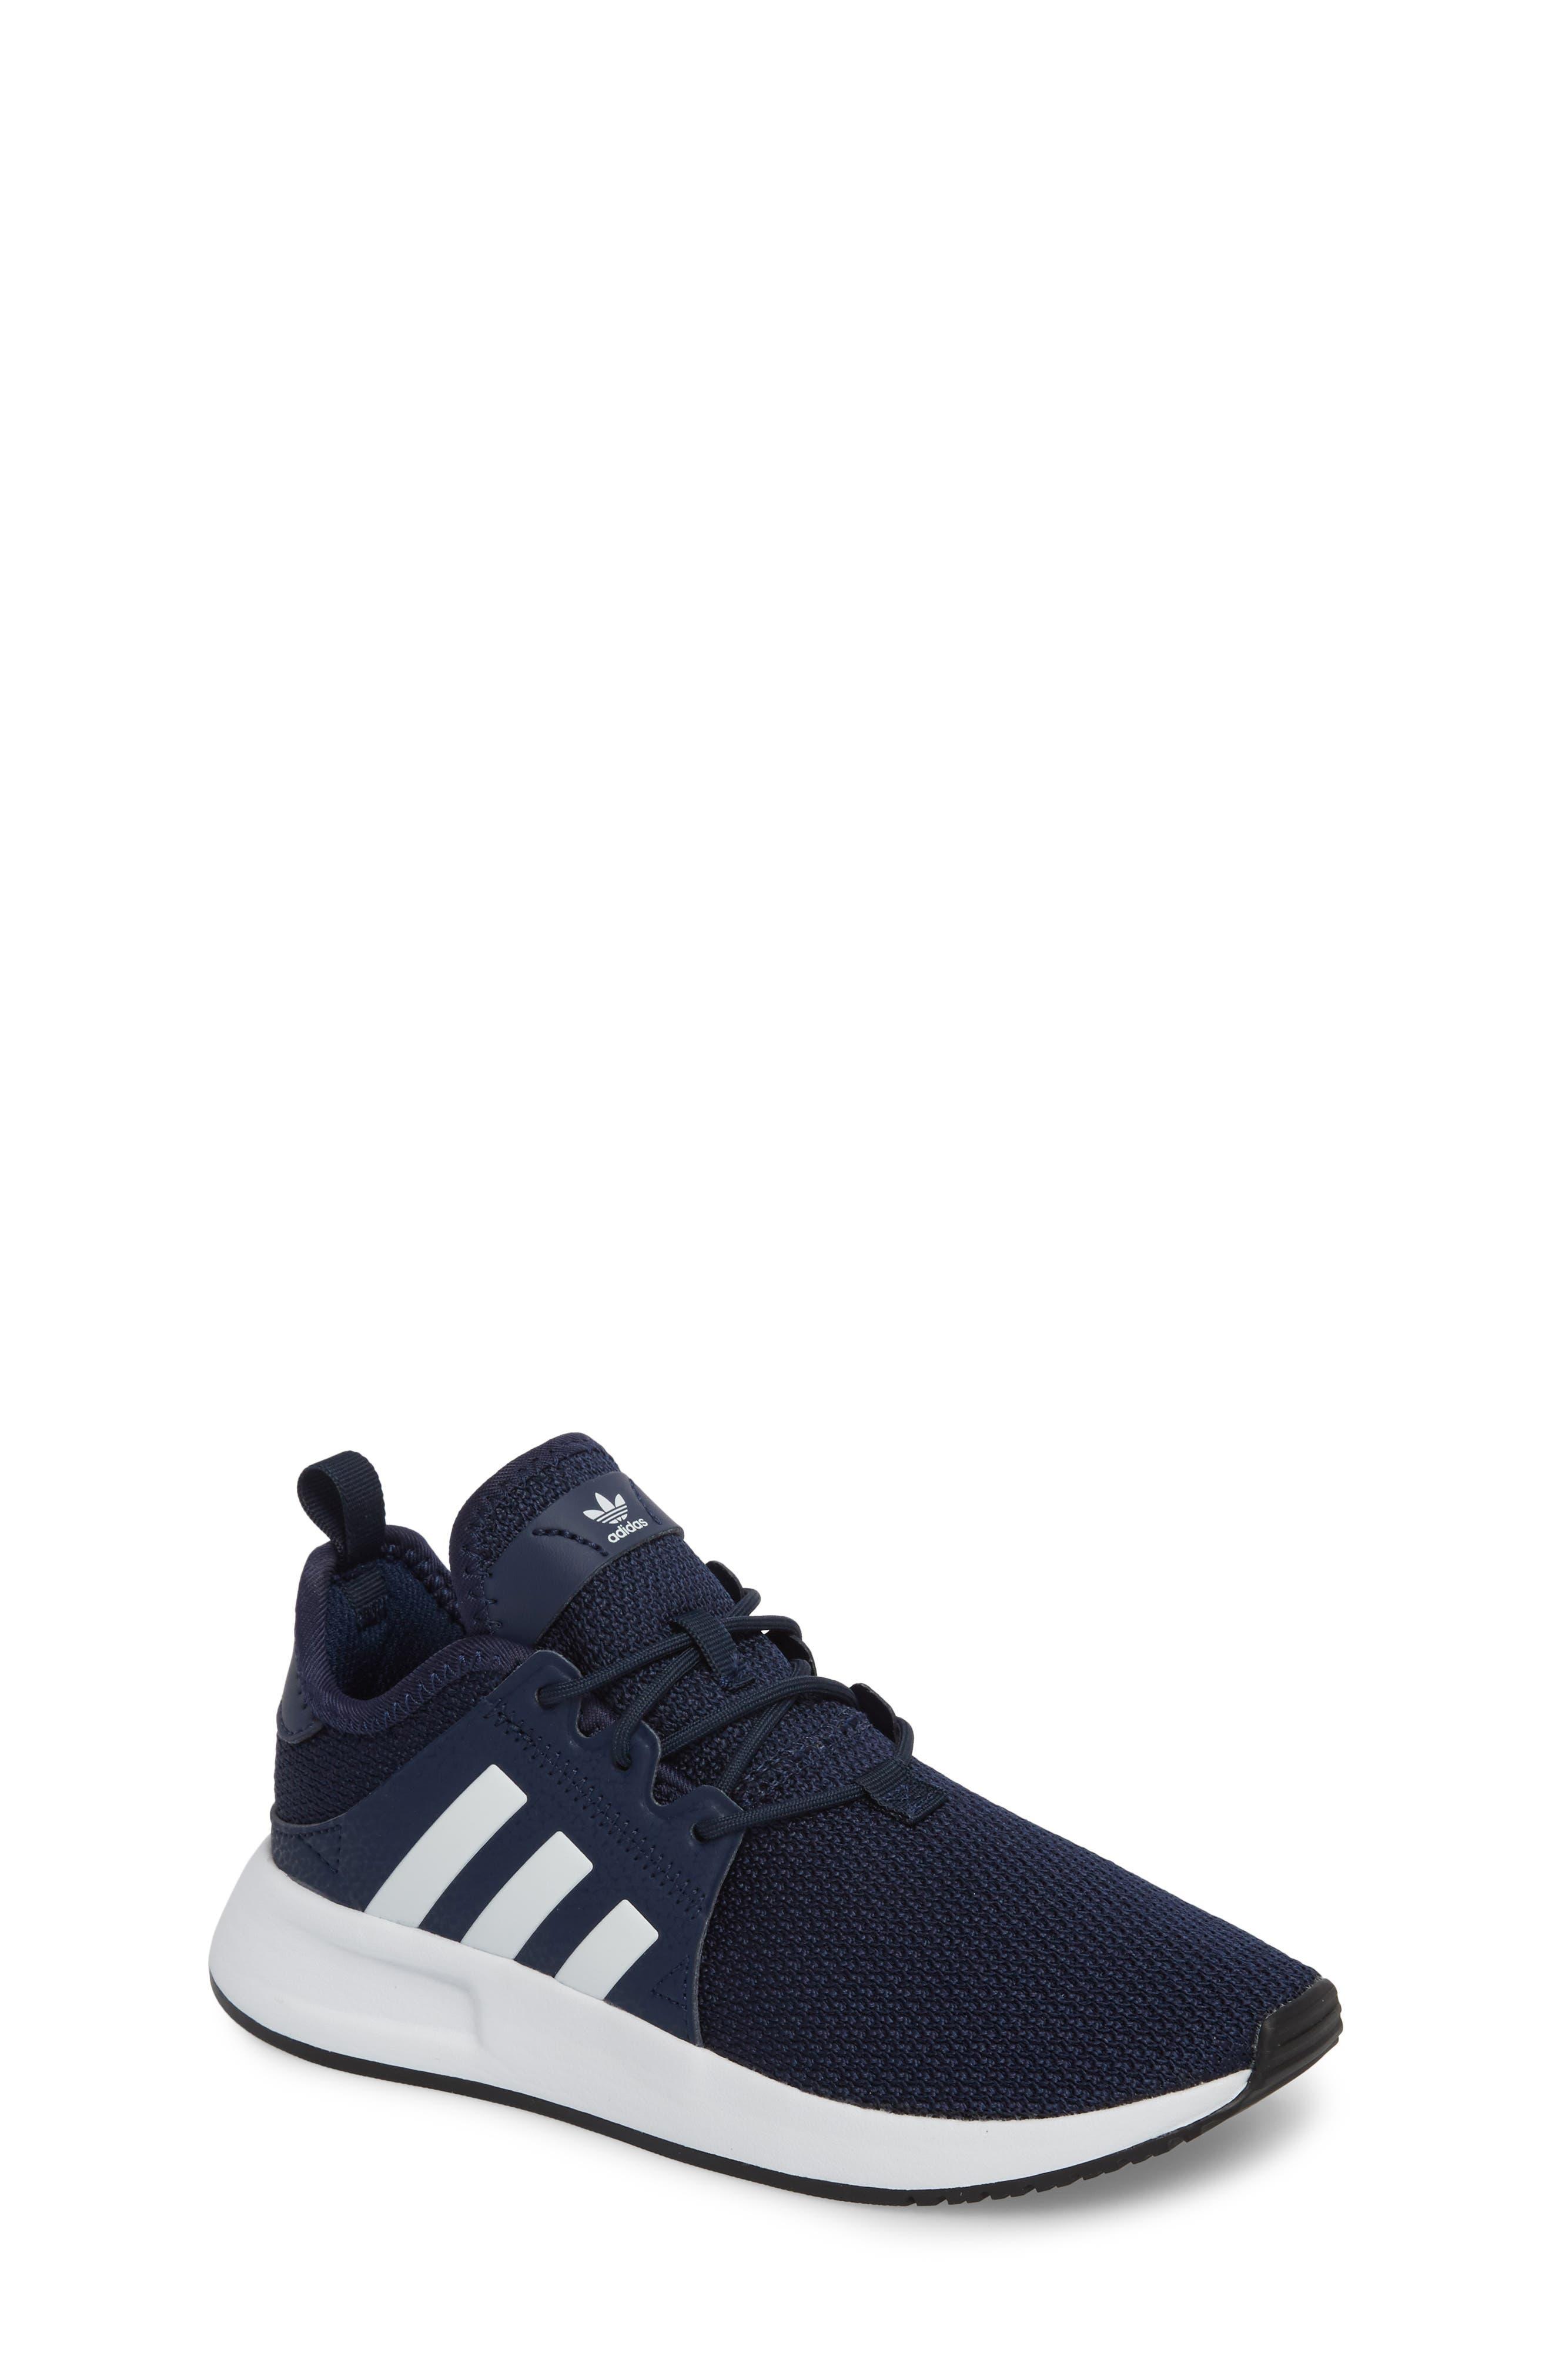 85a04cfa5bcfc ... cheap adidas xplr sneaker baby walker toddler little kid big kid 0d9db  36078